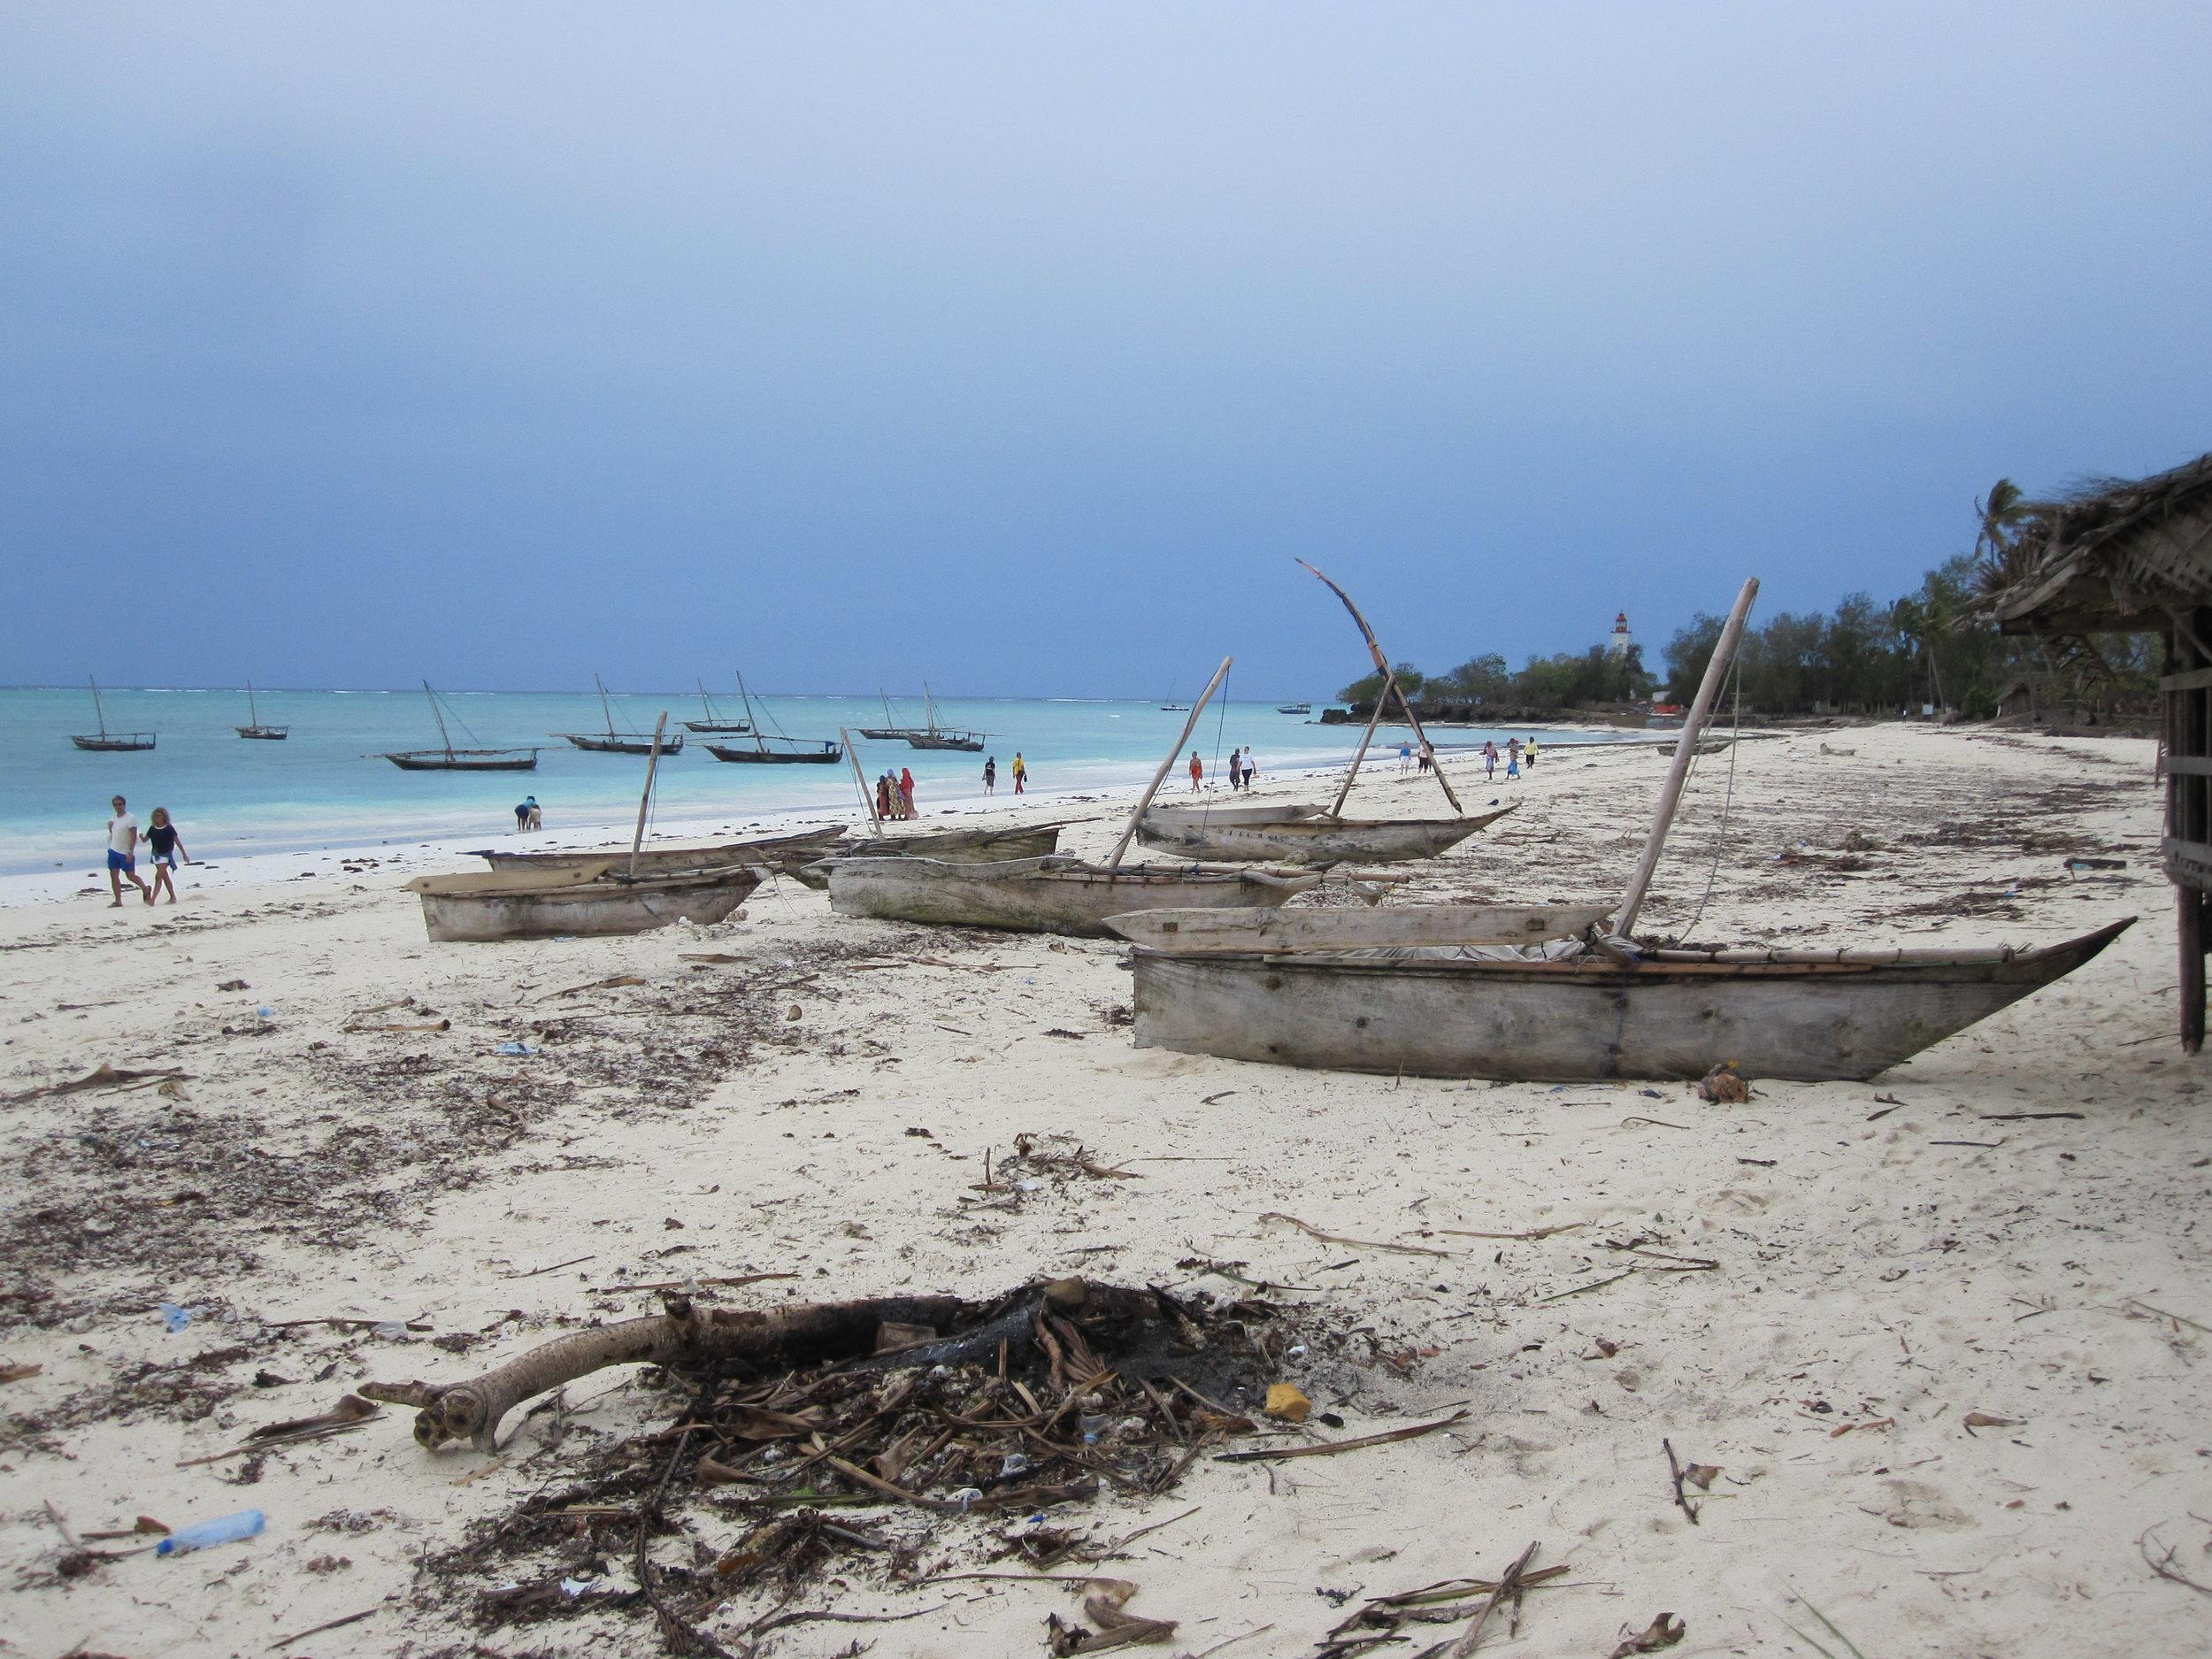 Dhows on the beach in Zanzibar